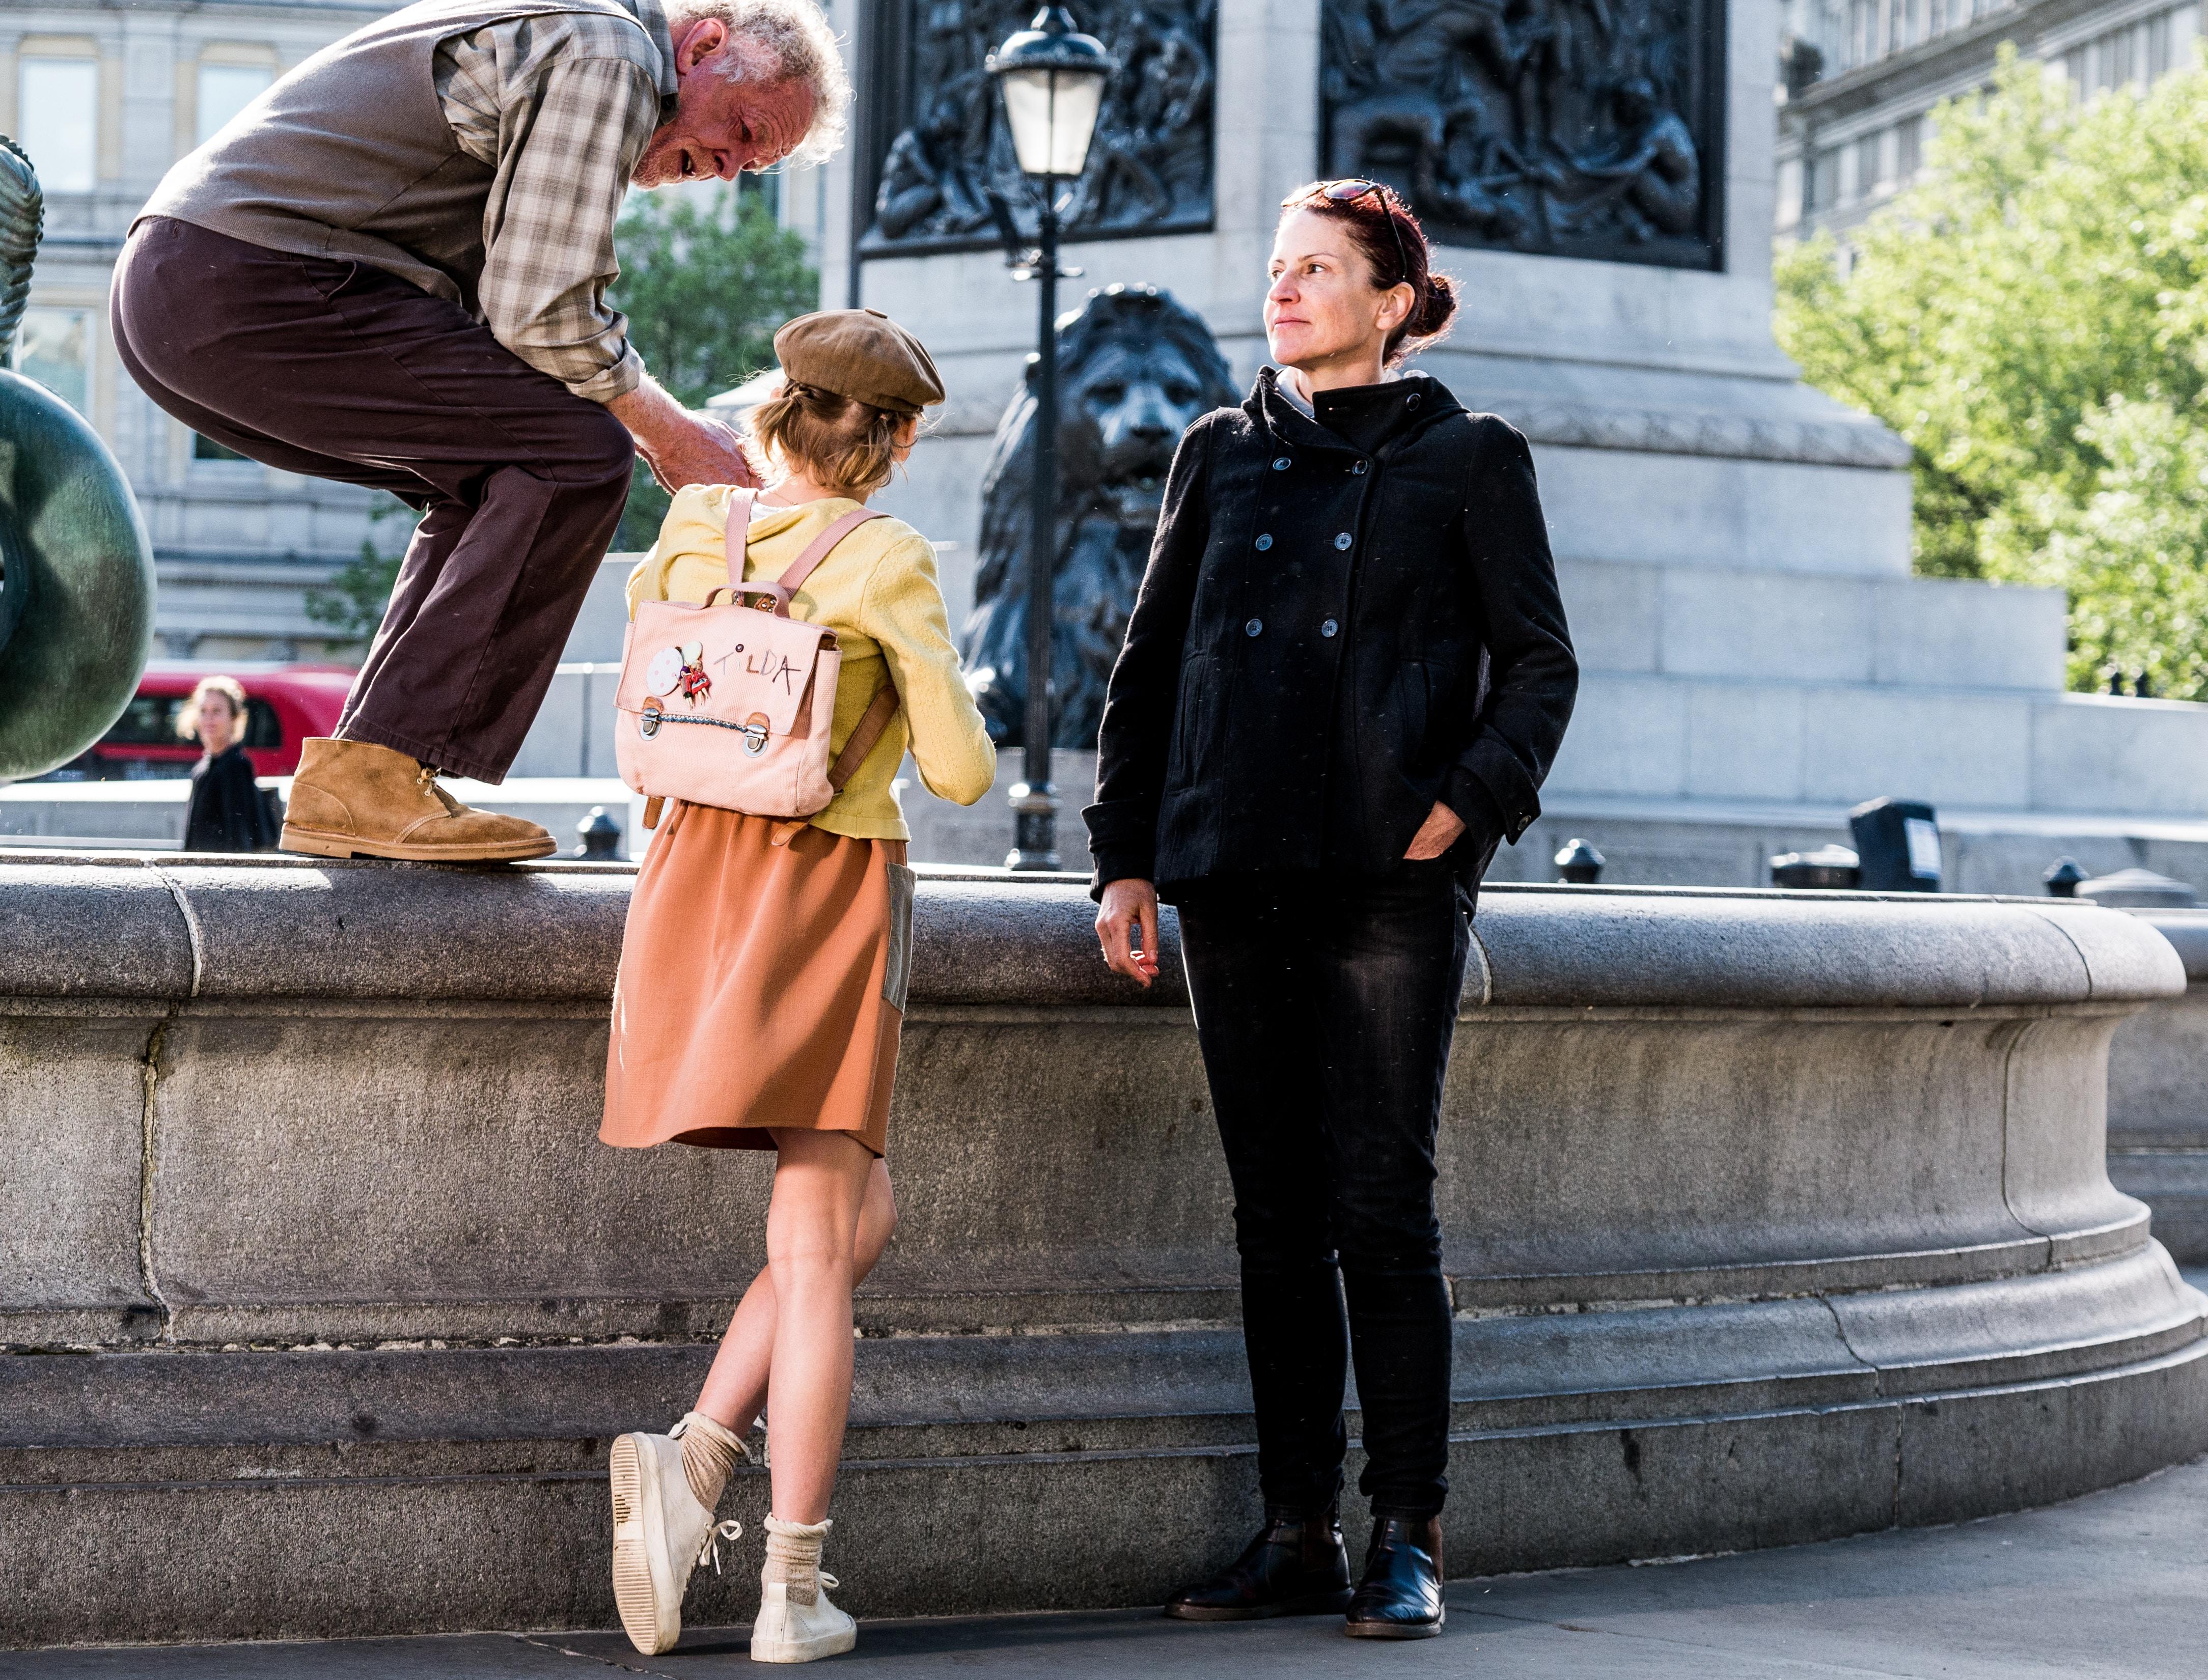 woman standing near city fountain